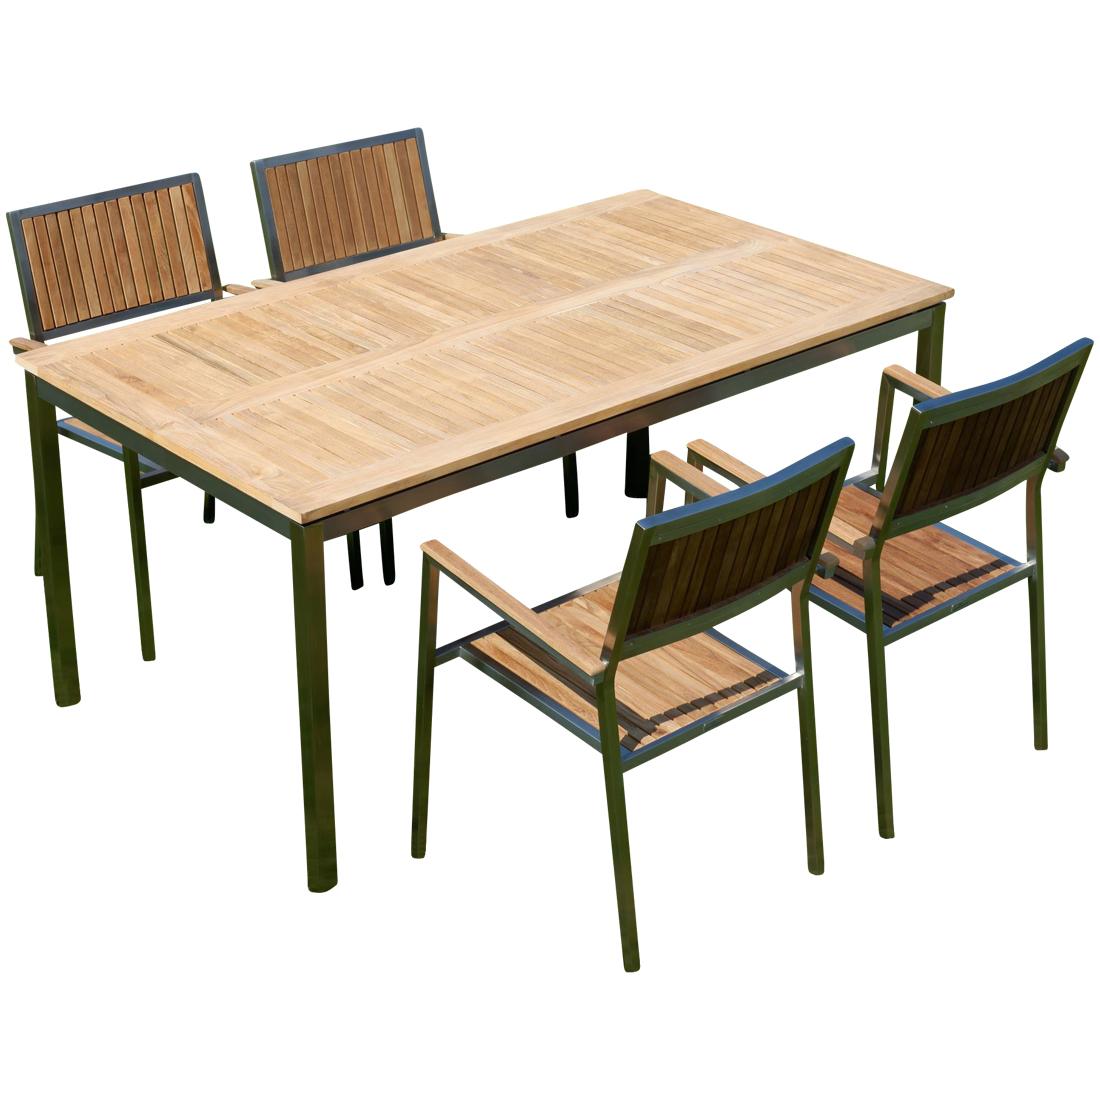 Gartengarnitur Edelstahl Teak Set Tisch 160x90 Cm 4 Teak Sessel